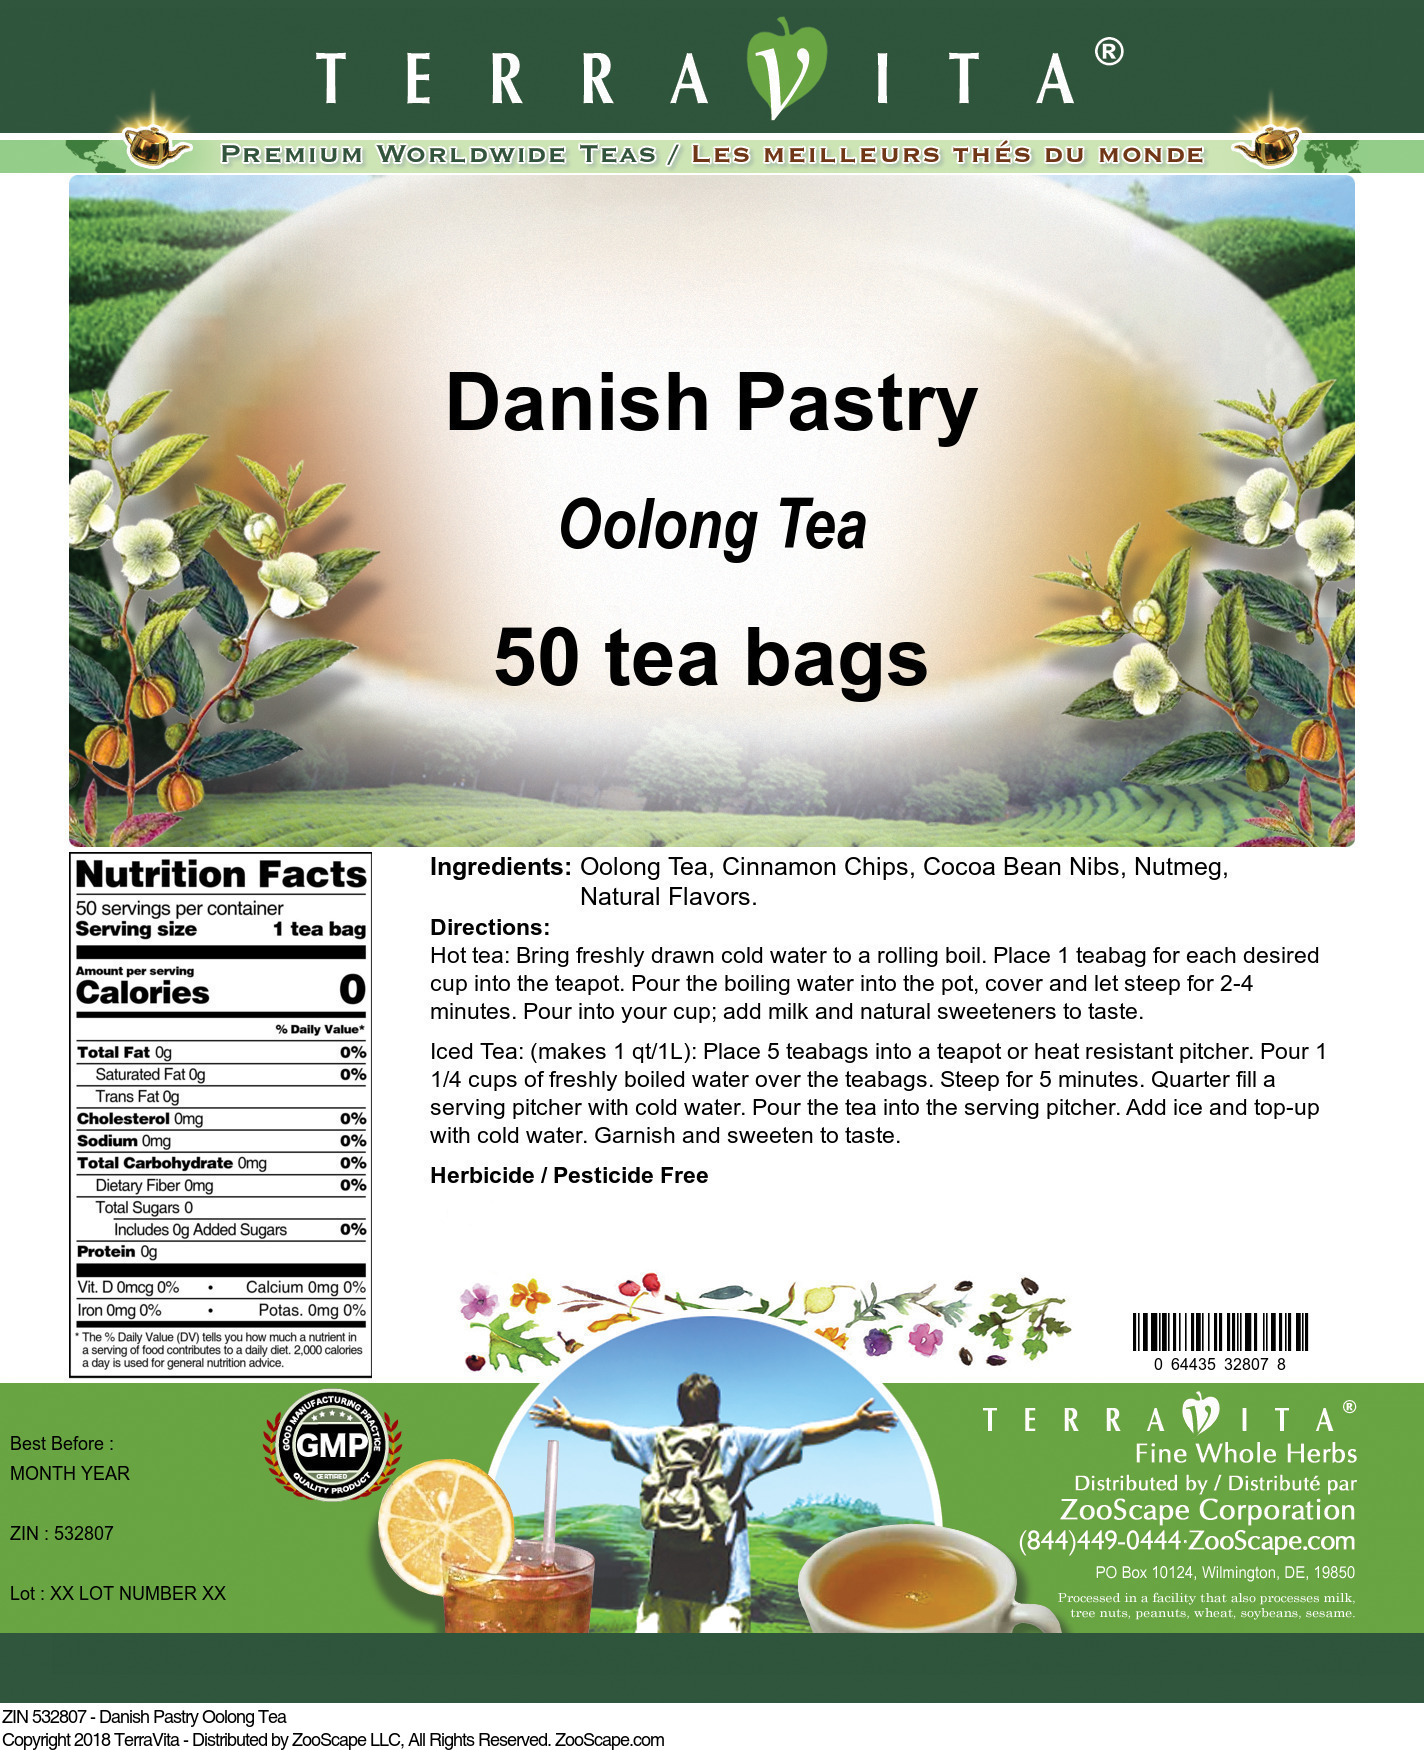 Danish Pastry Oolong Tea